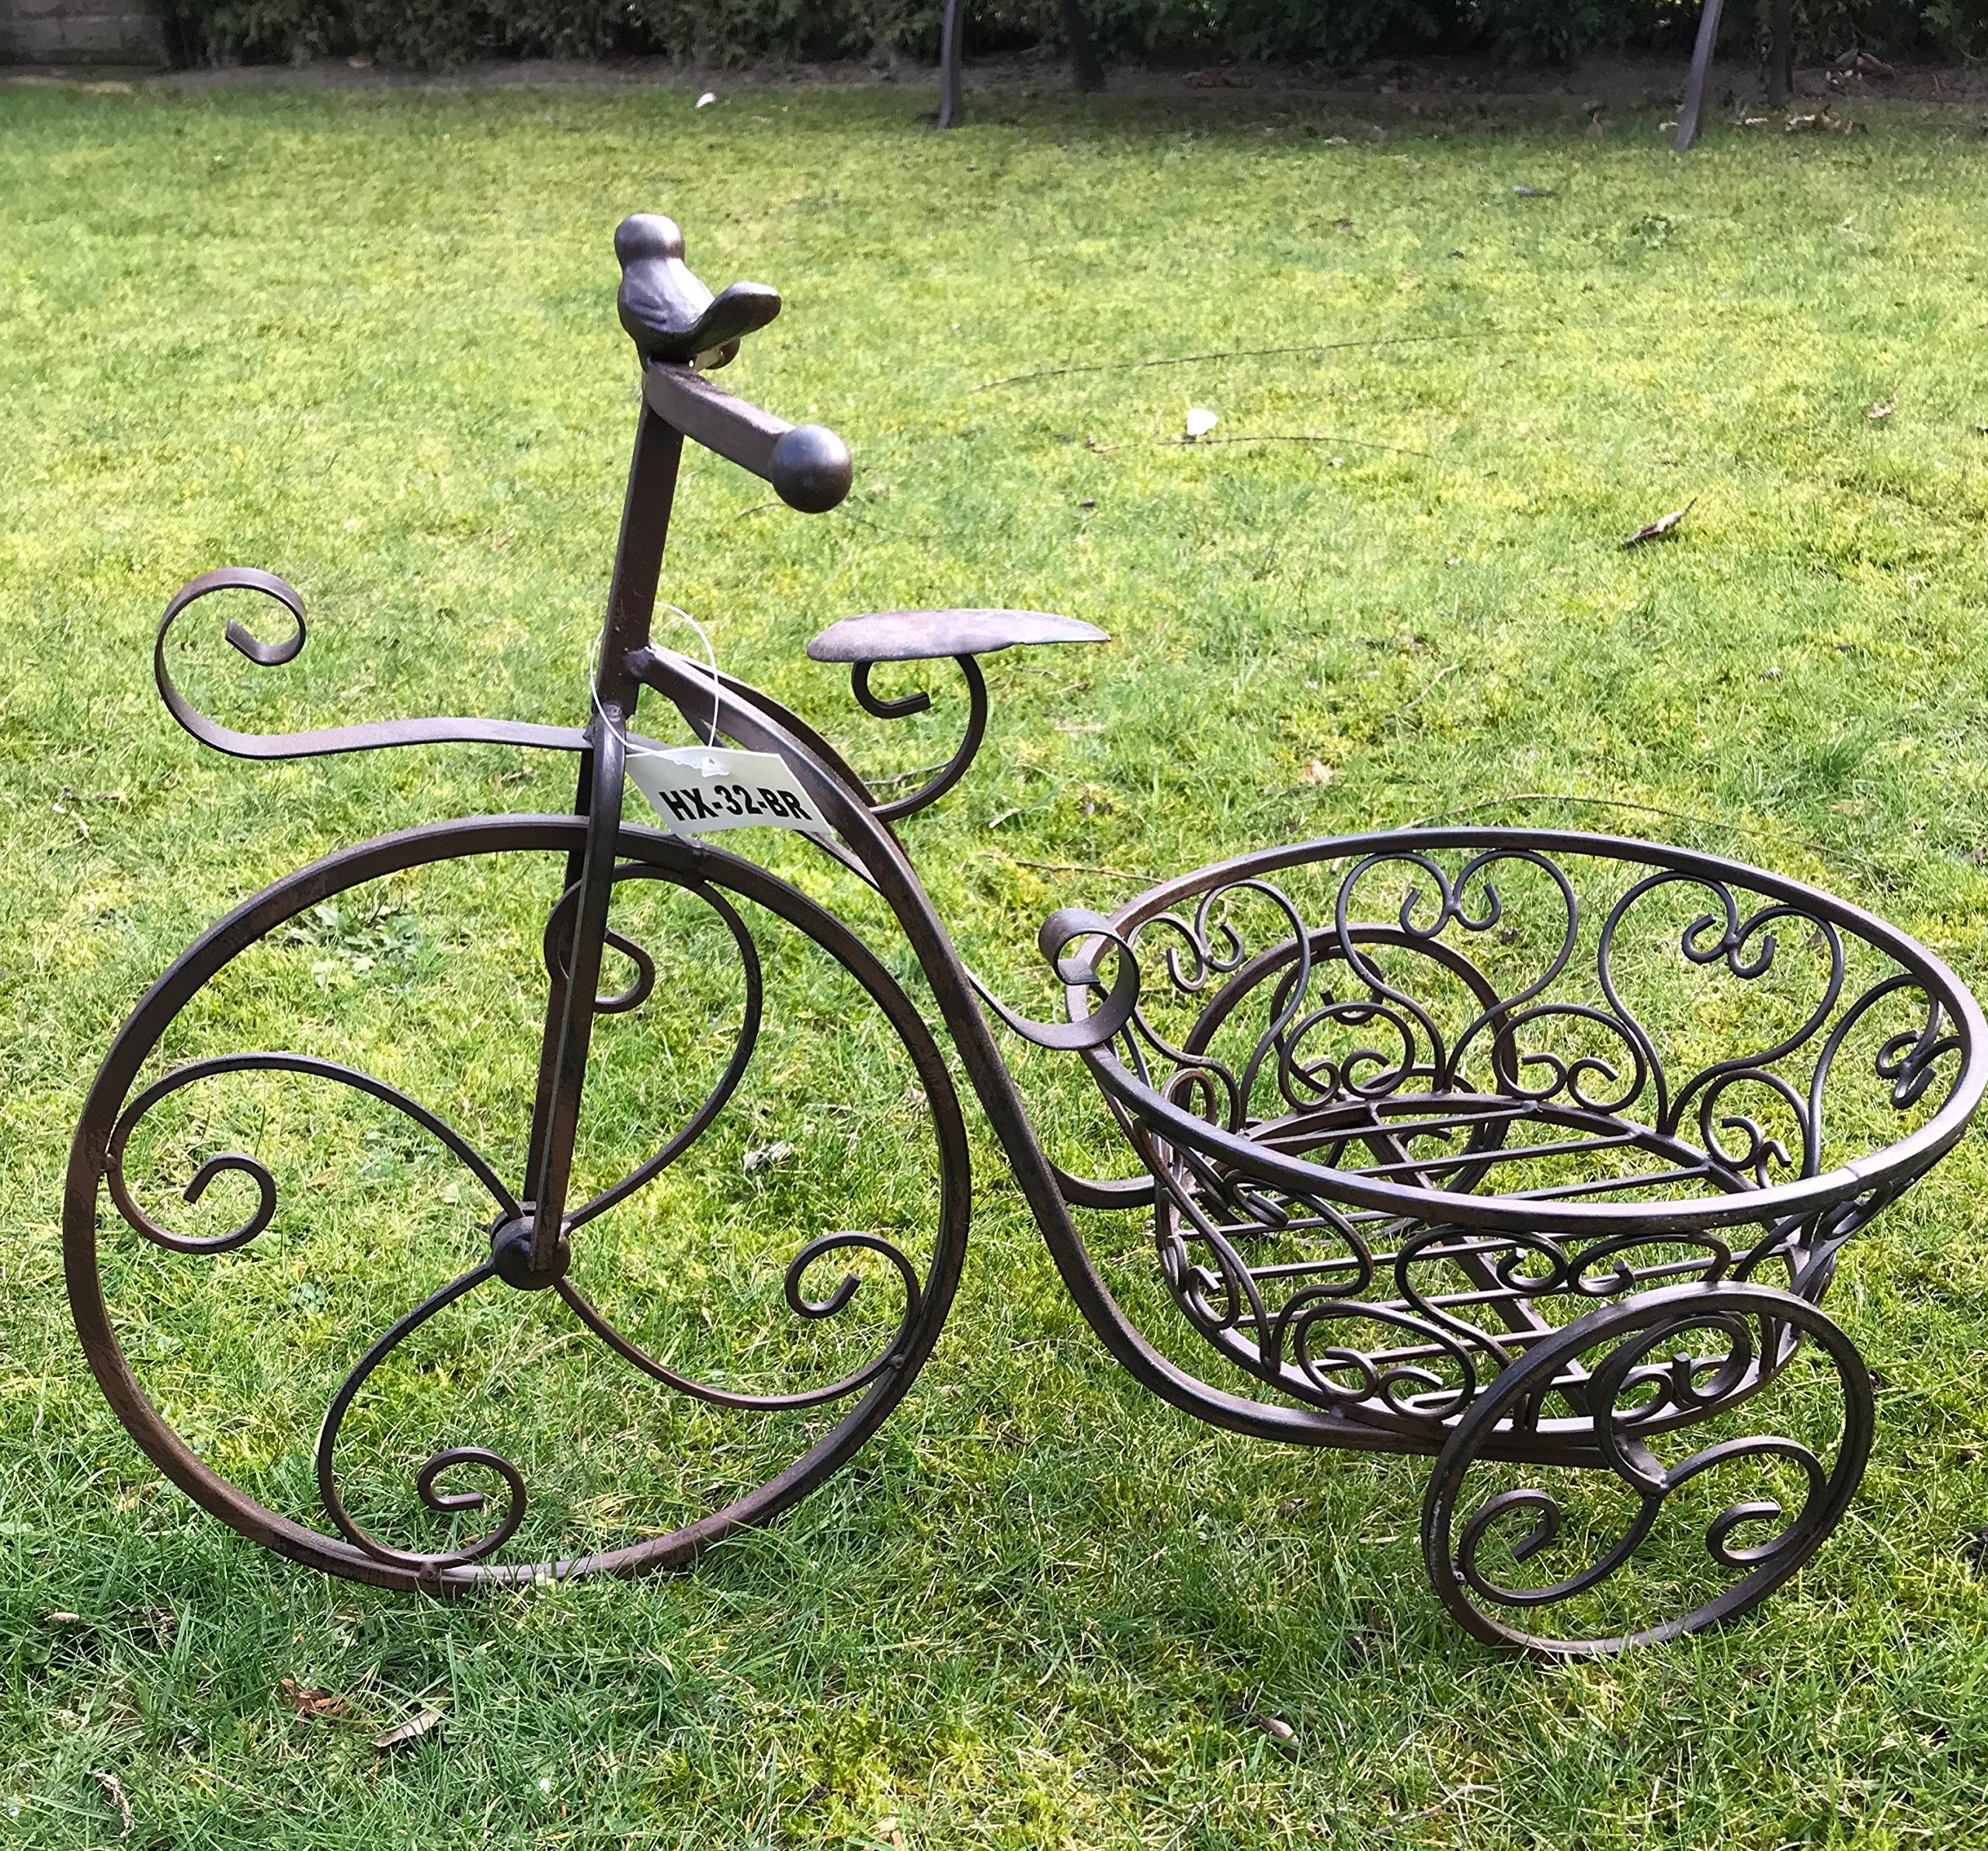 Moritz® Macetero bicicleta soporte de macetas cesta 55 x 37 x 27 ...